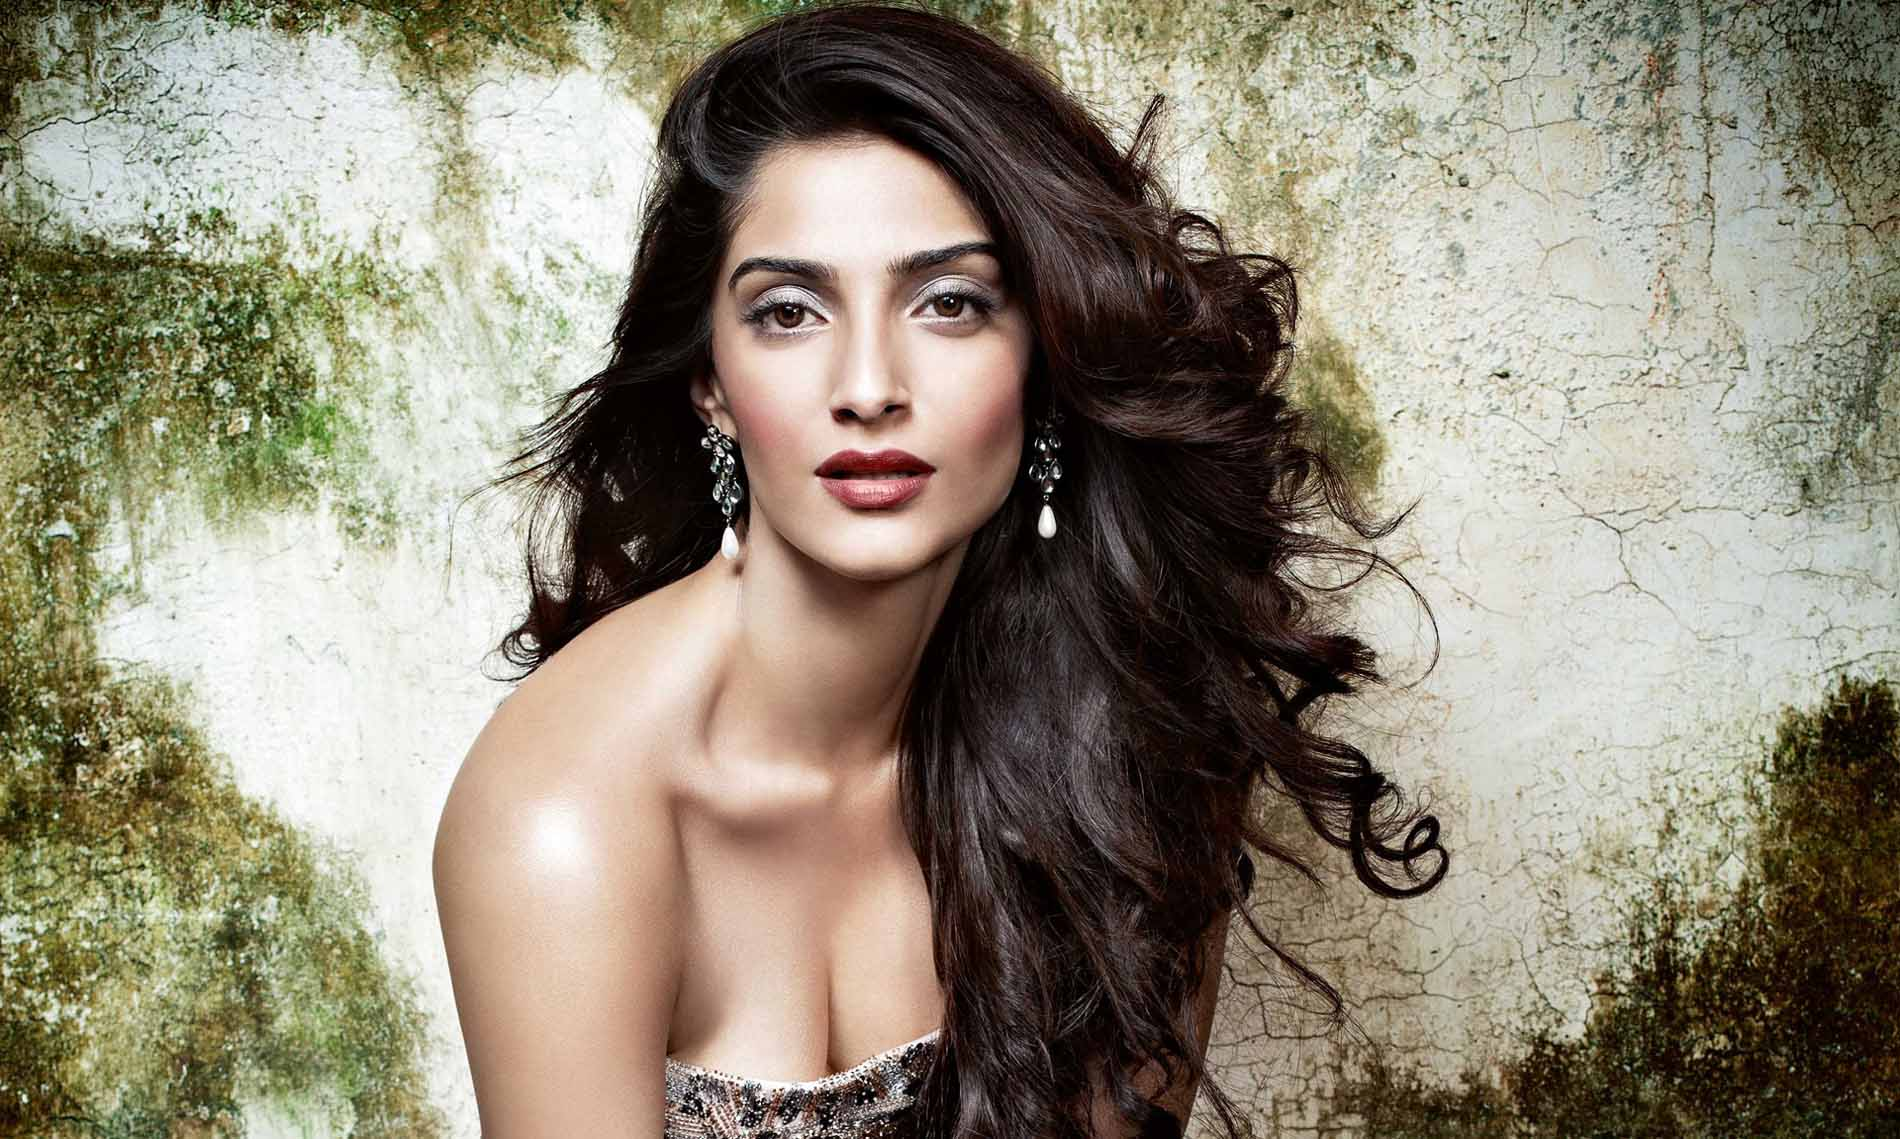 Sonam Kapoor Hot Photos And Wallpapers In Bikini